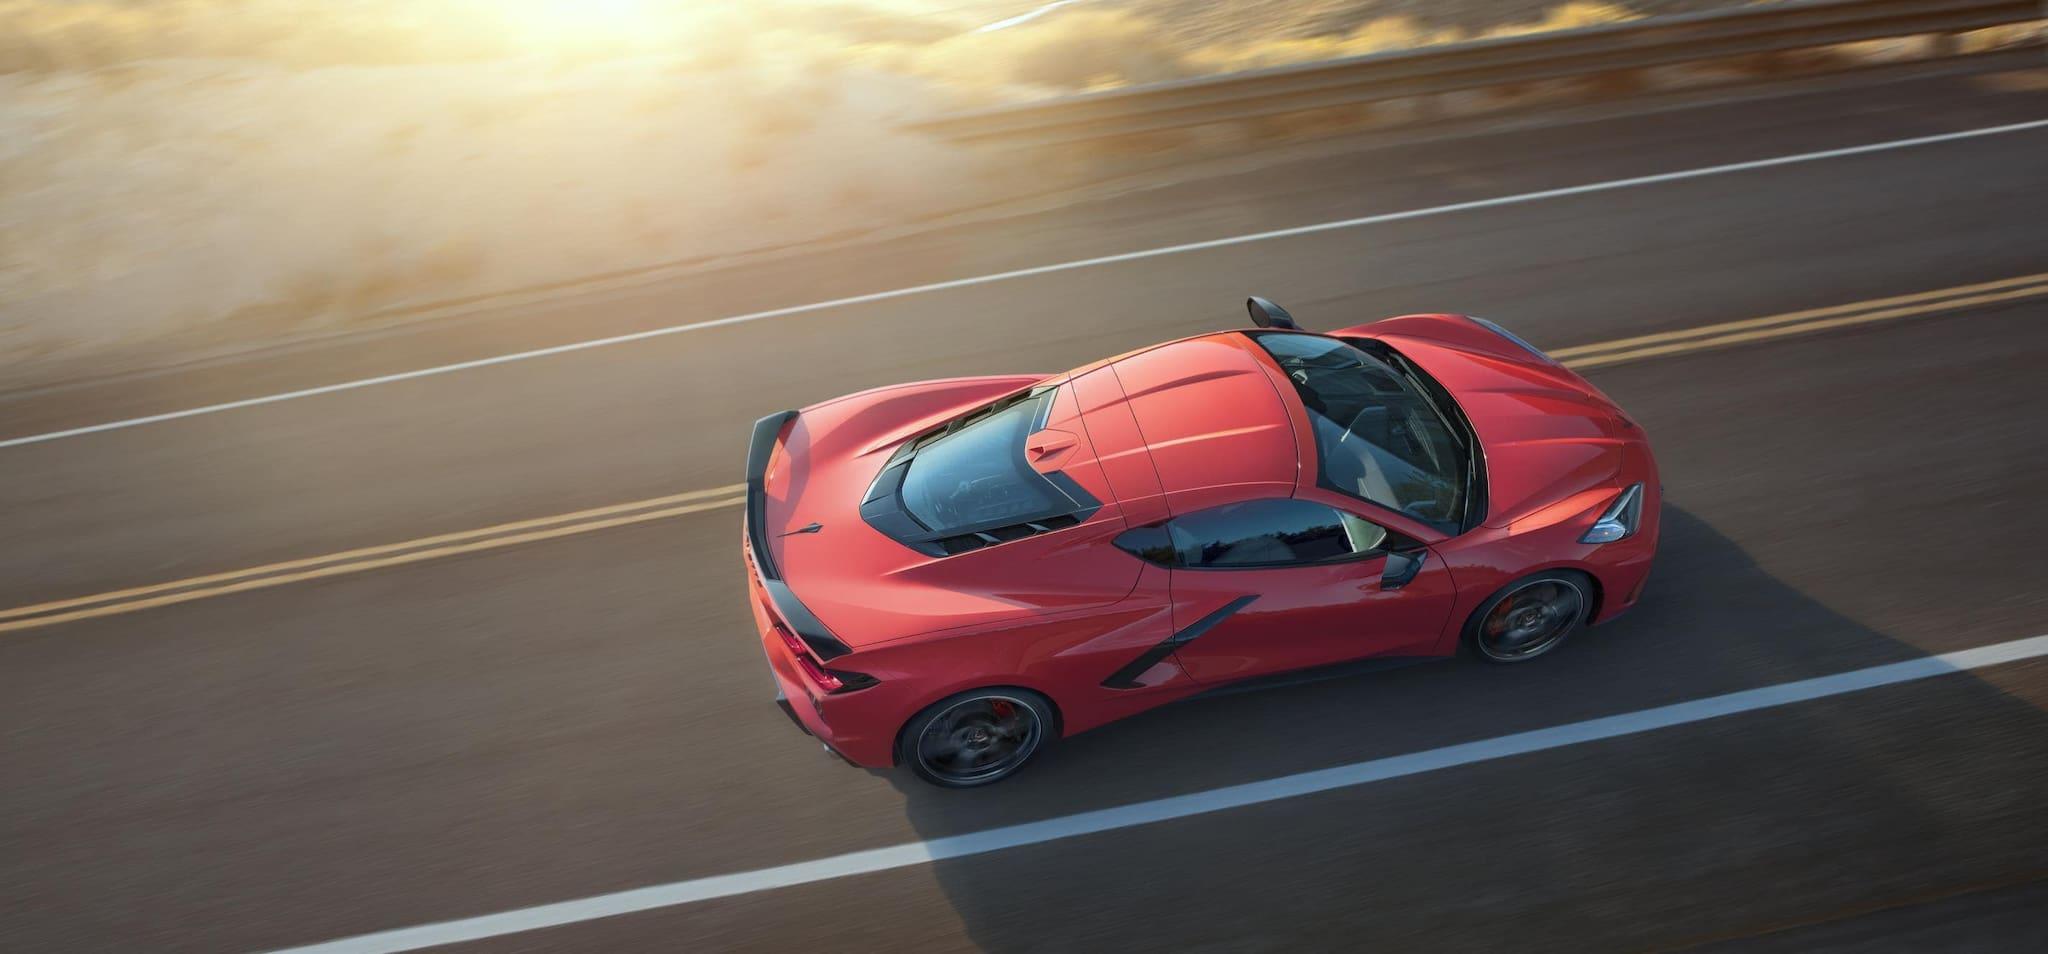 Chevrolet Releases C8 Corvette Paint and Interior Options